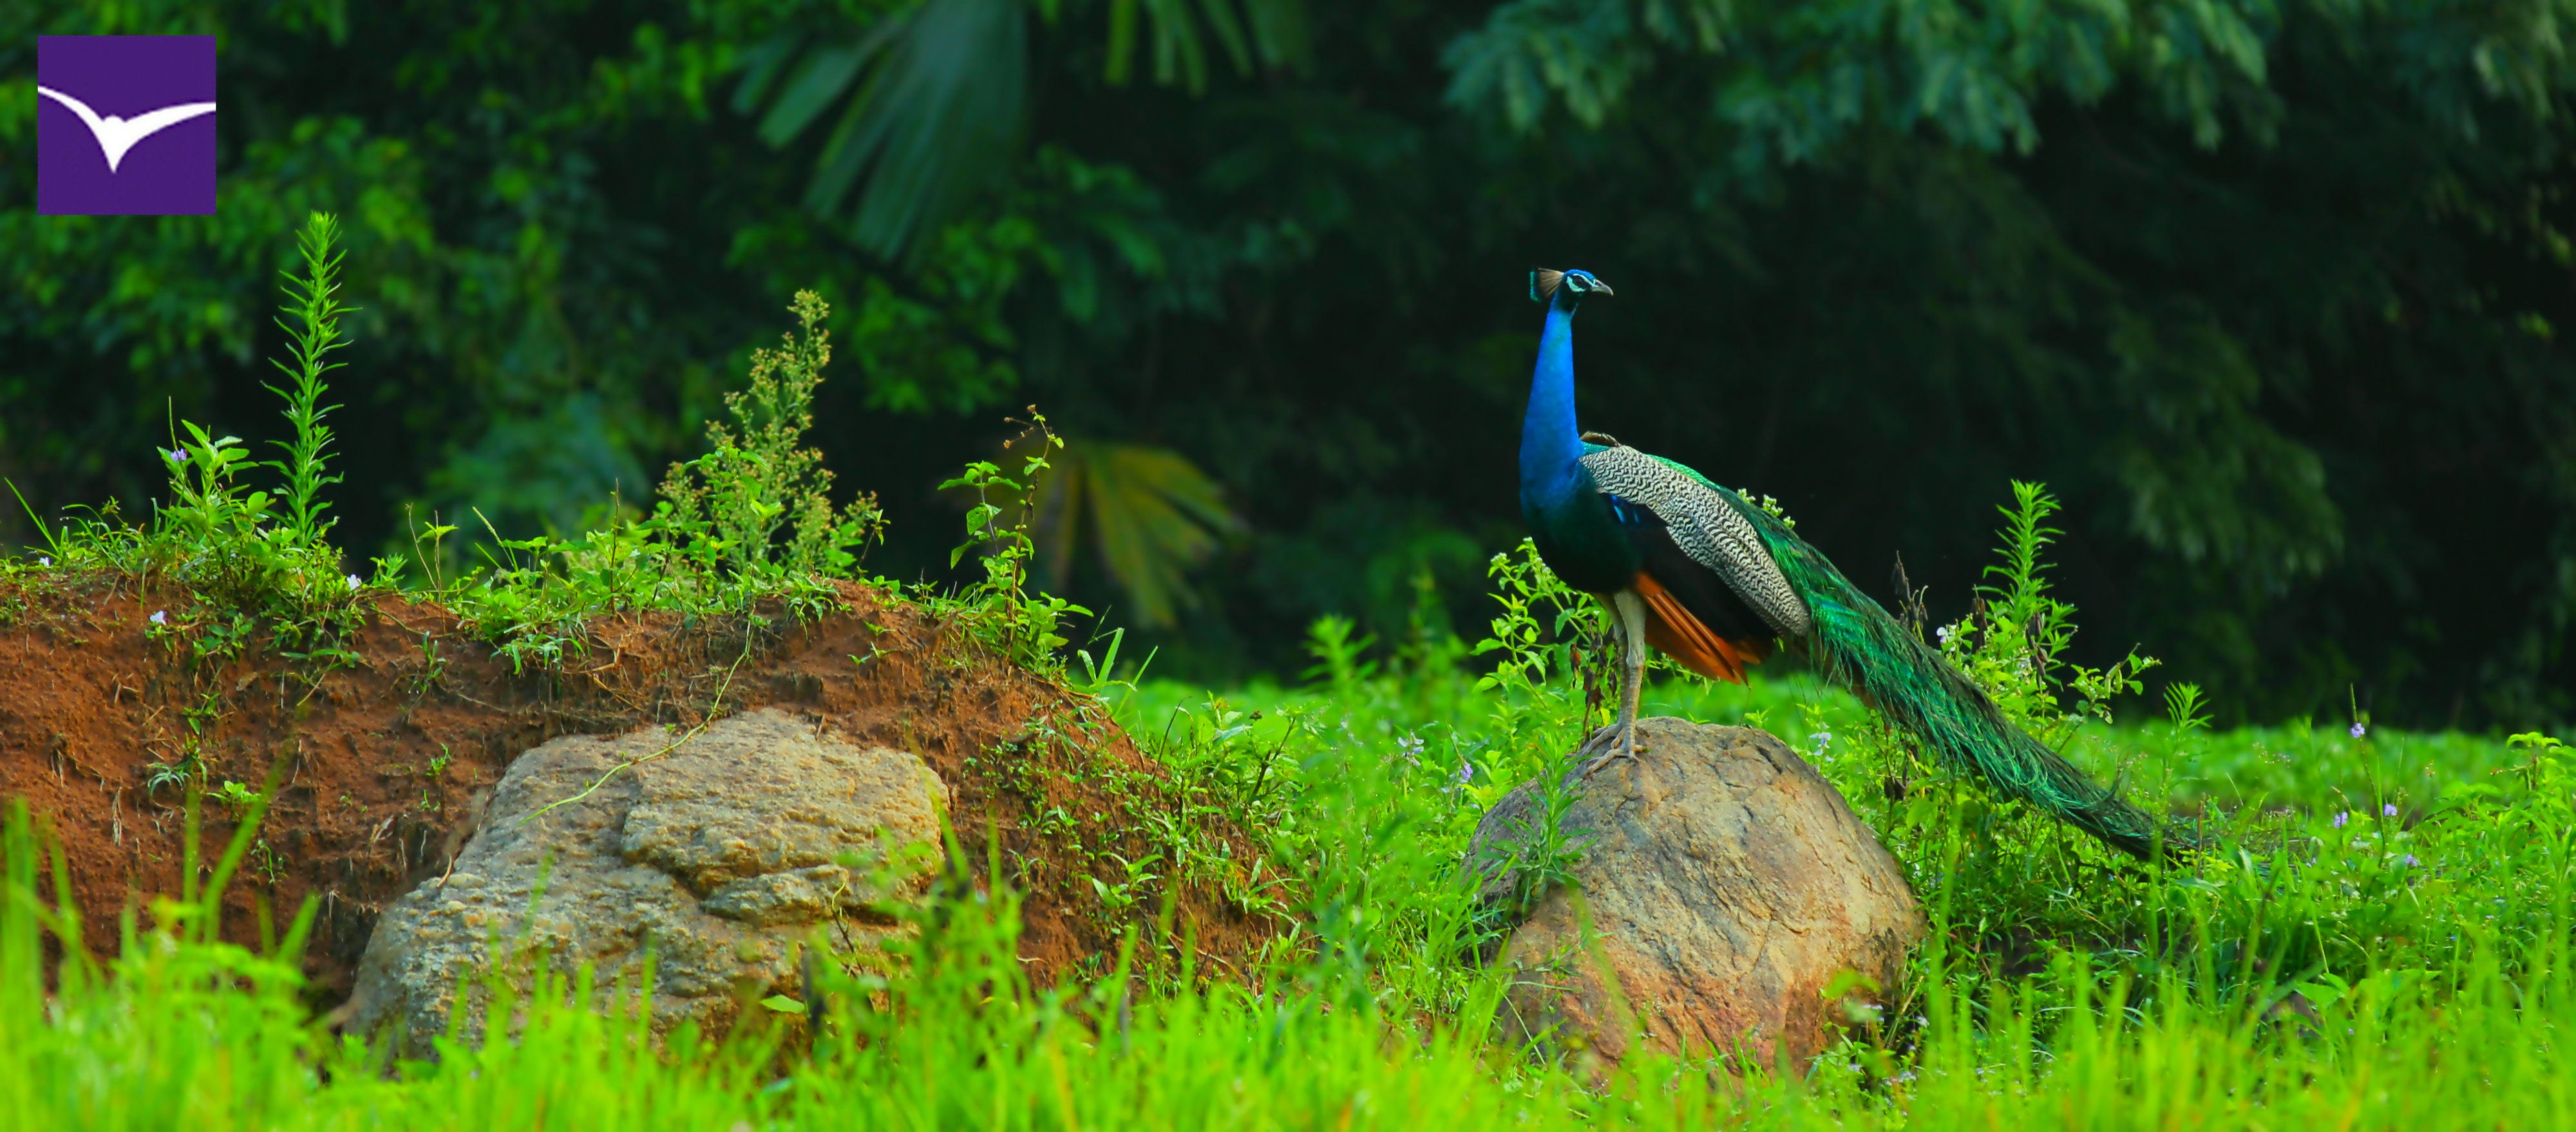 Bird Watching at Ella Jungle ! #ella #jungle #resort #tourism #srilanka #nature #eco #travel Like Us:https://www.facebook.com/ellajungleresort